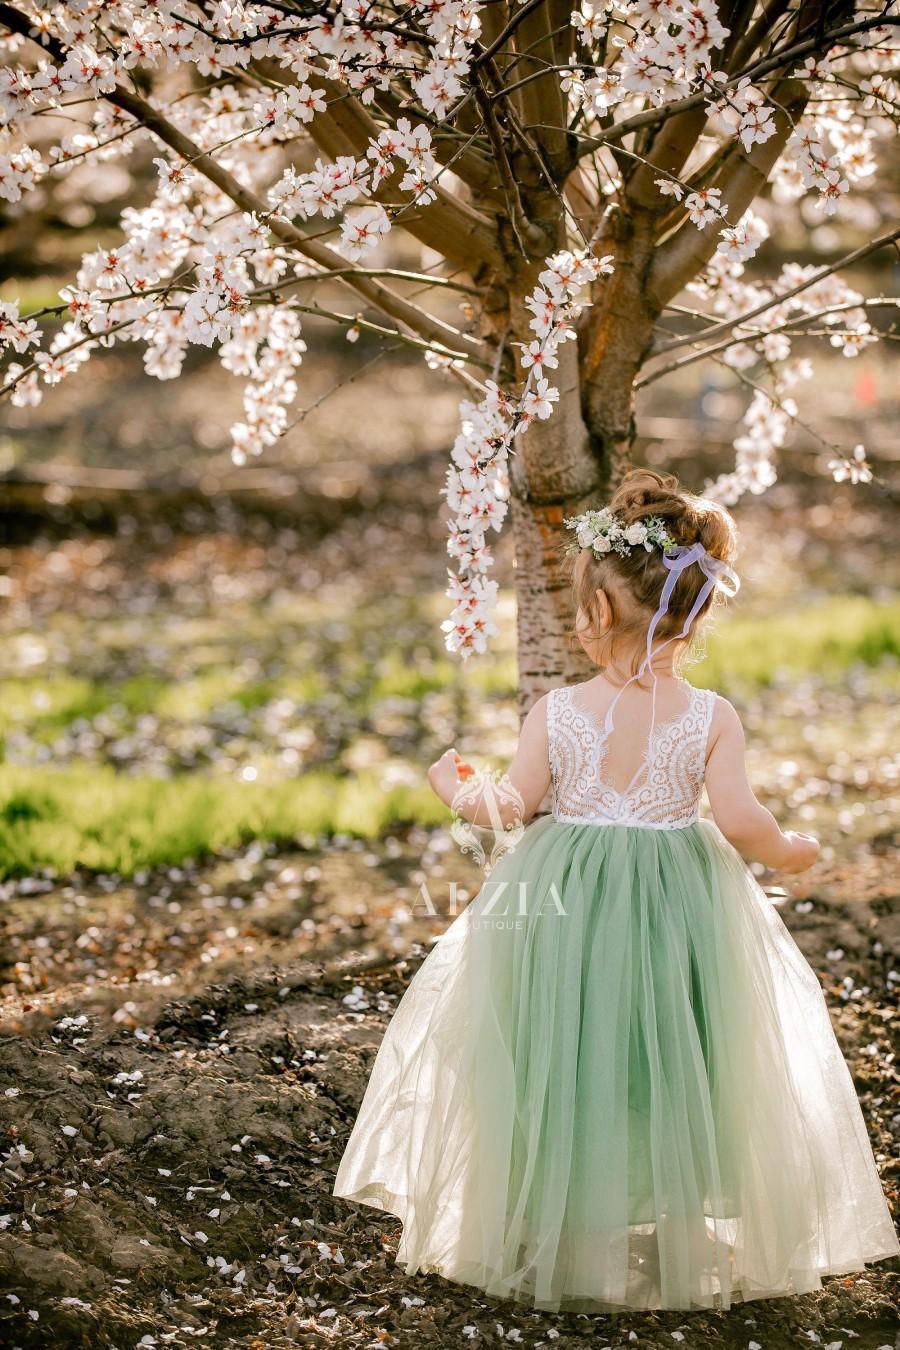 Wedding - Full Length Sage Green Tulle Sleeveless Lace Top Scalloped Edges Back Party Flower Girl Dress